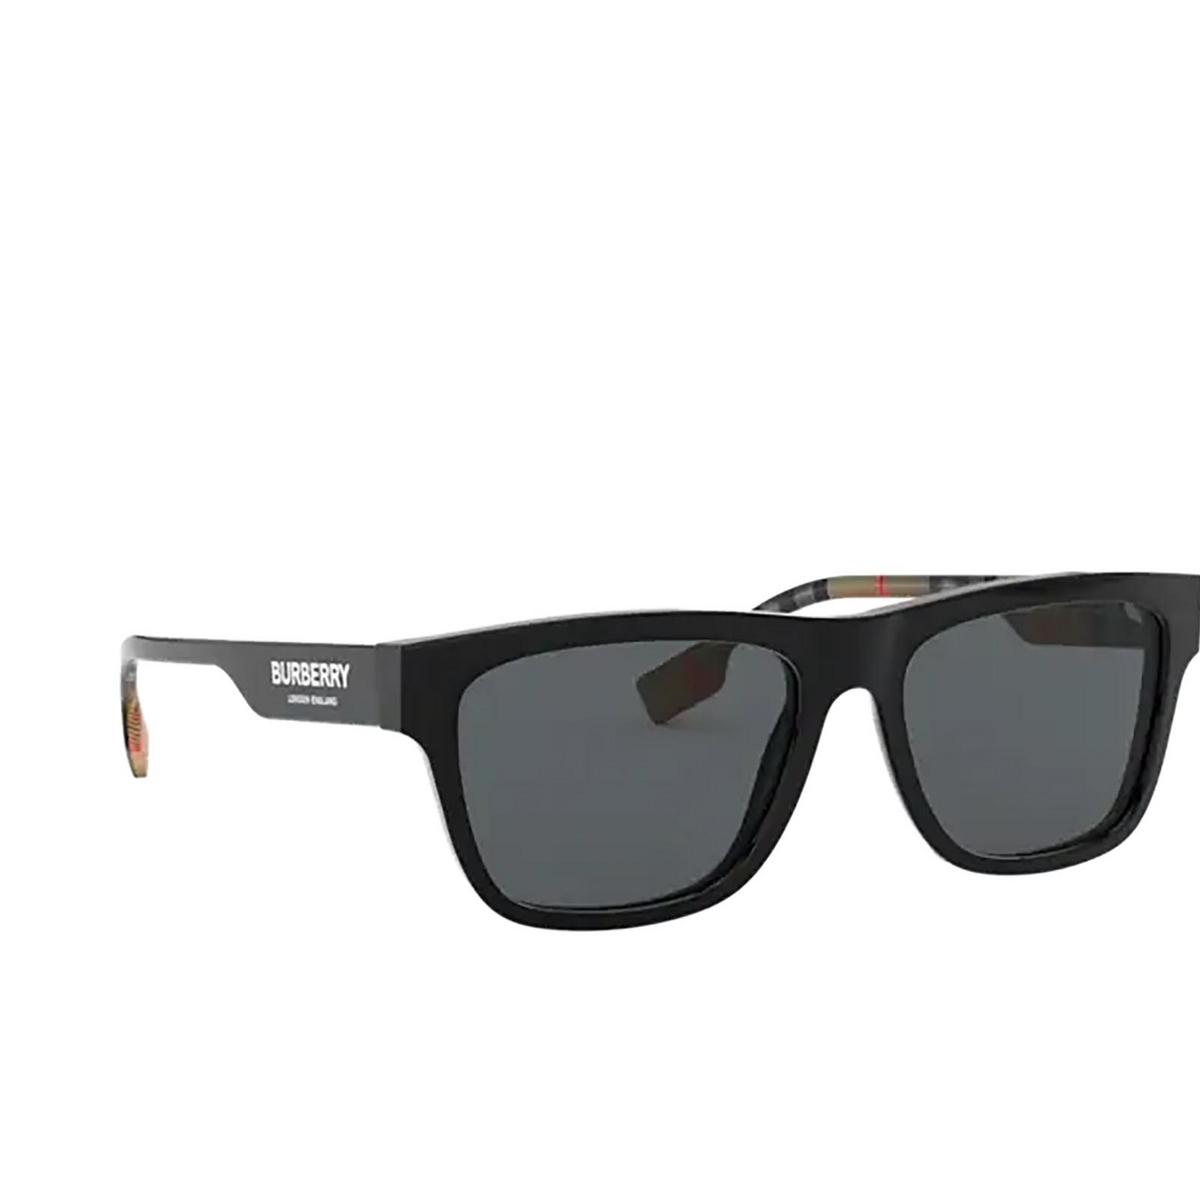 Burberry® Square Sunglasses: BE4293 color Black 377381 - three-quarters view.